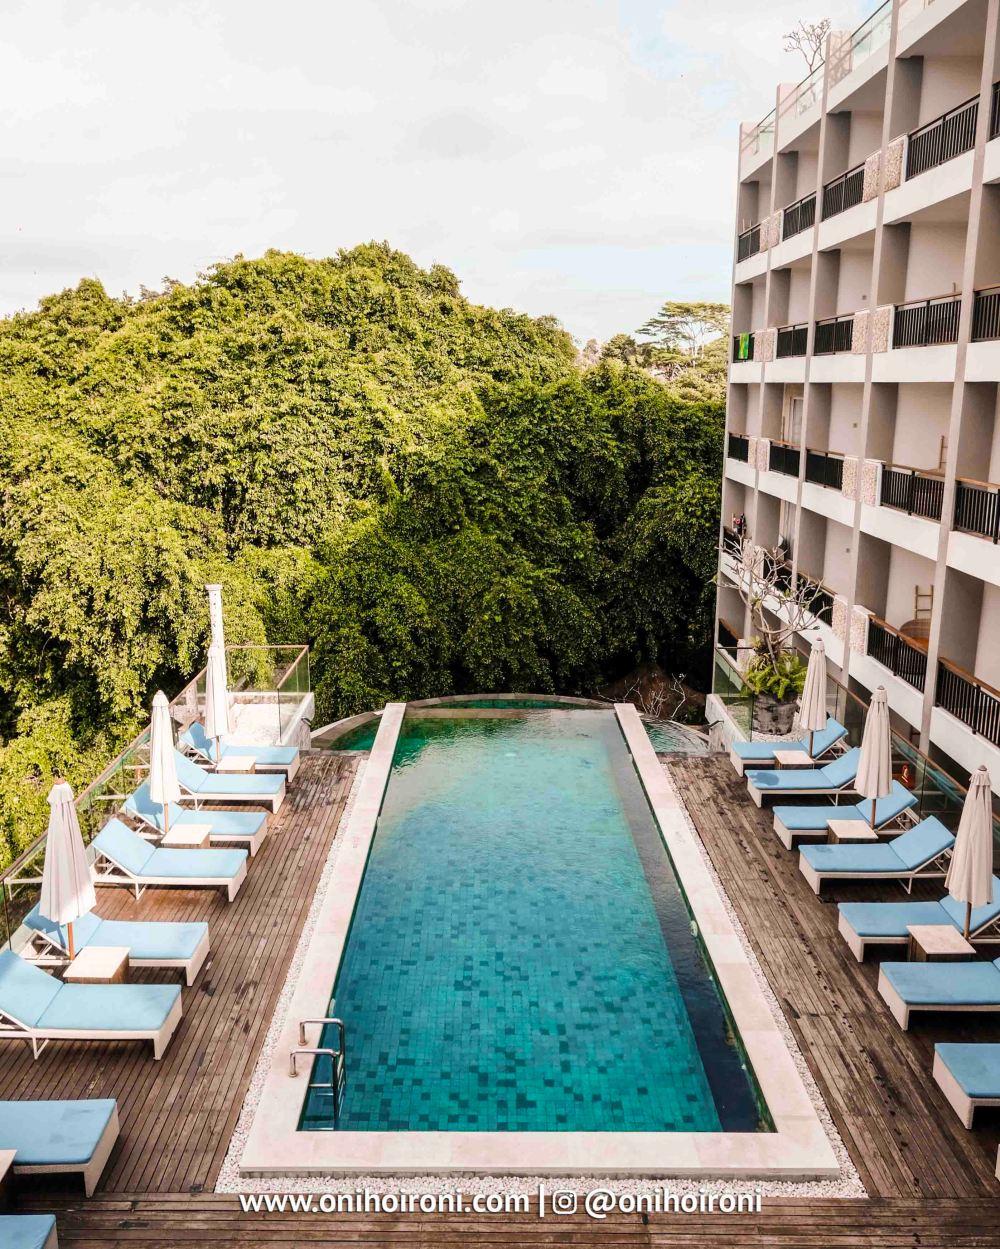 4 Swimming Pool Sthala Ubud Bali Oni Hoironi